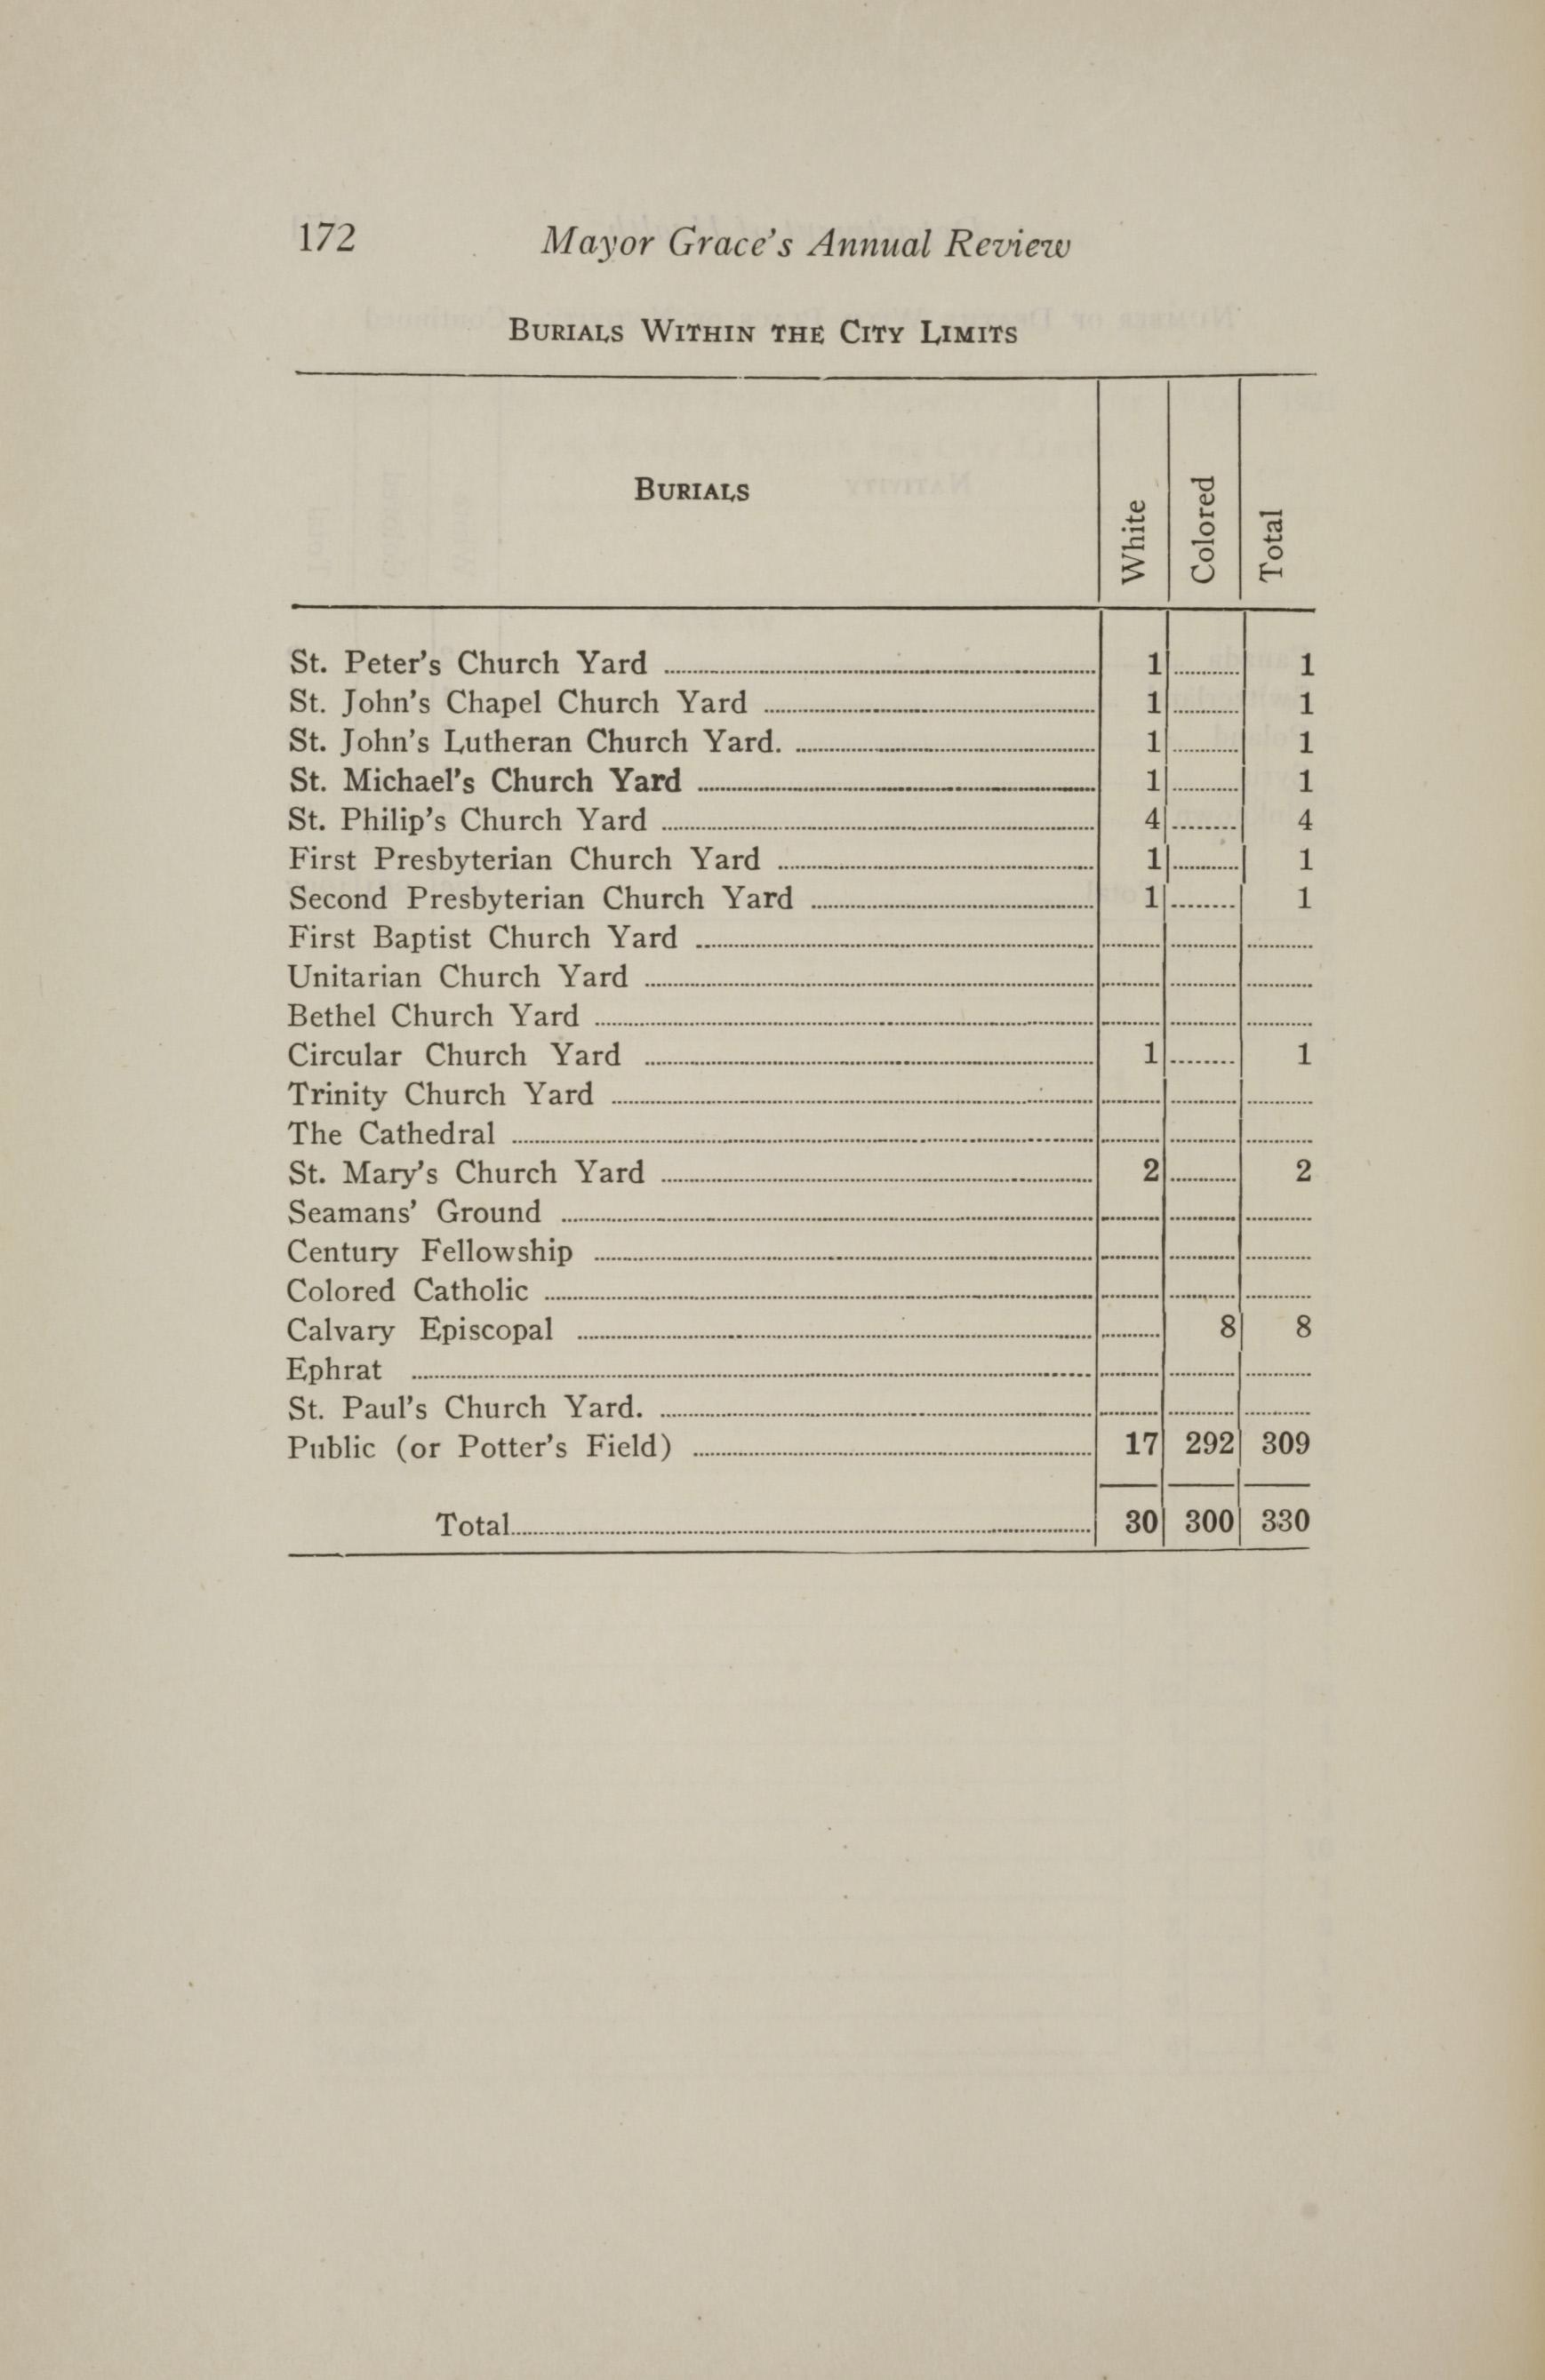 Charleston Yearbook, 1921, page 172